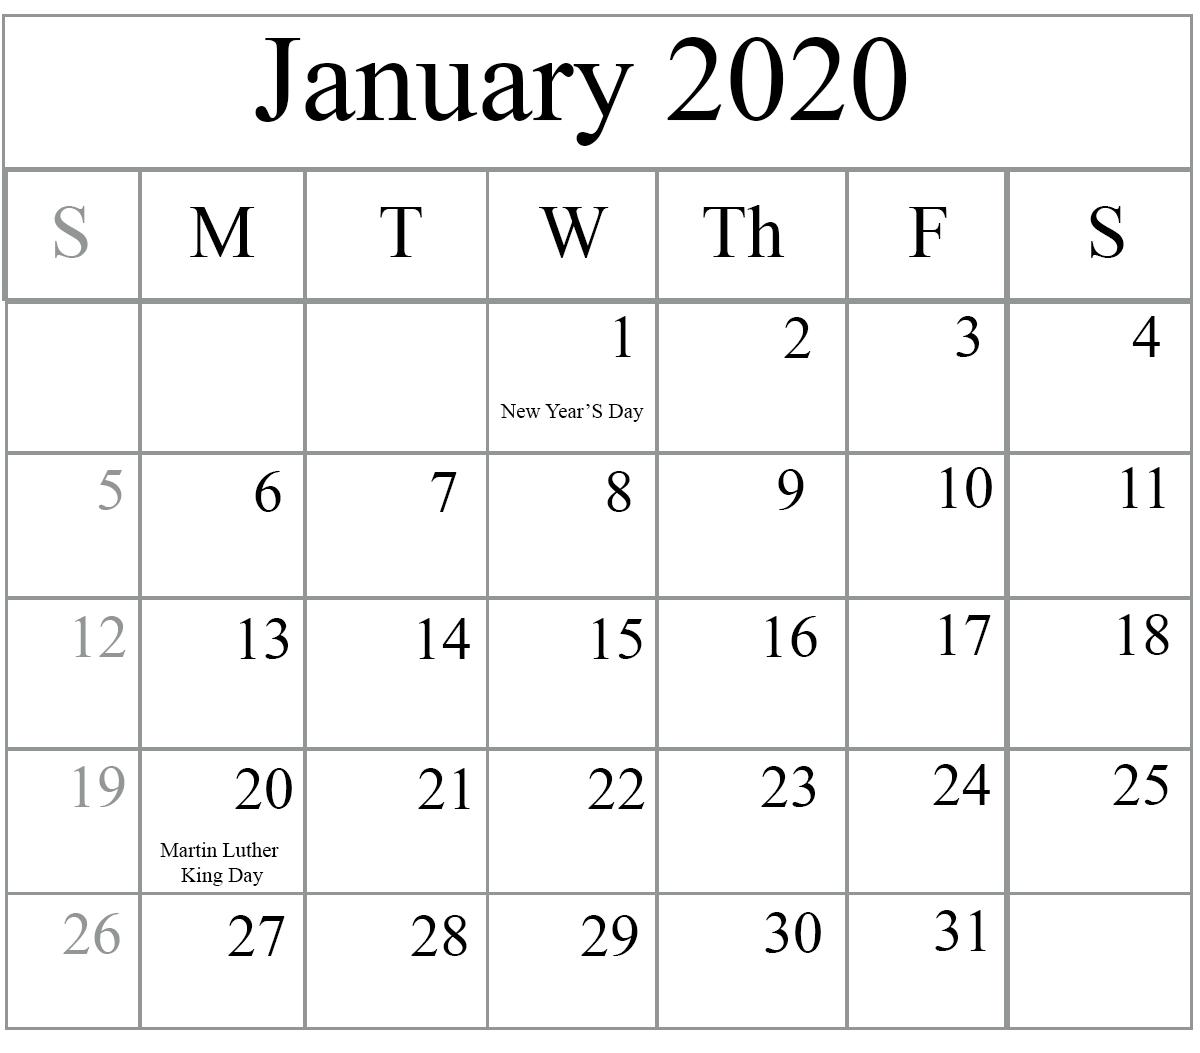 January 2020 Calendar Pdf | Printable Calendar Template